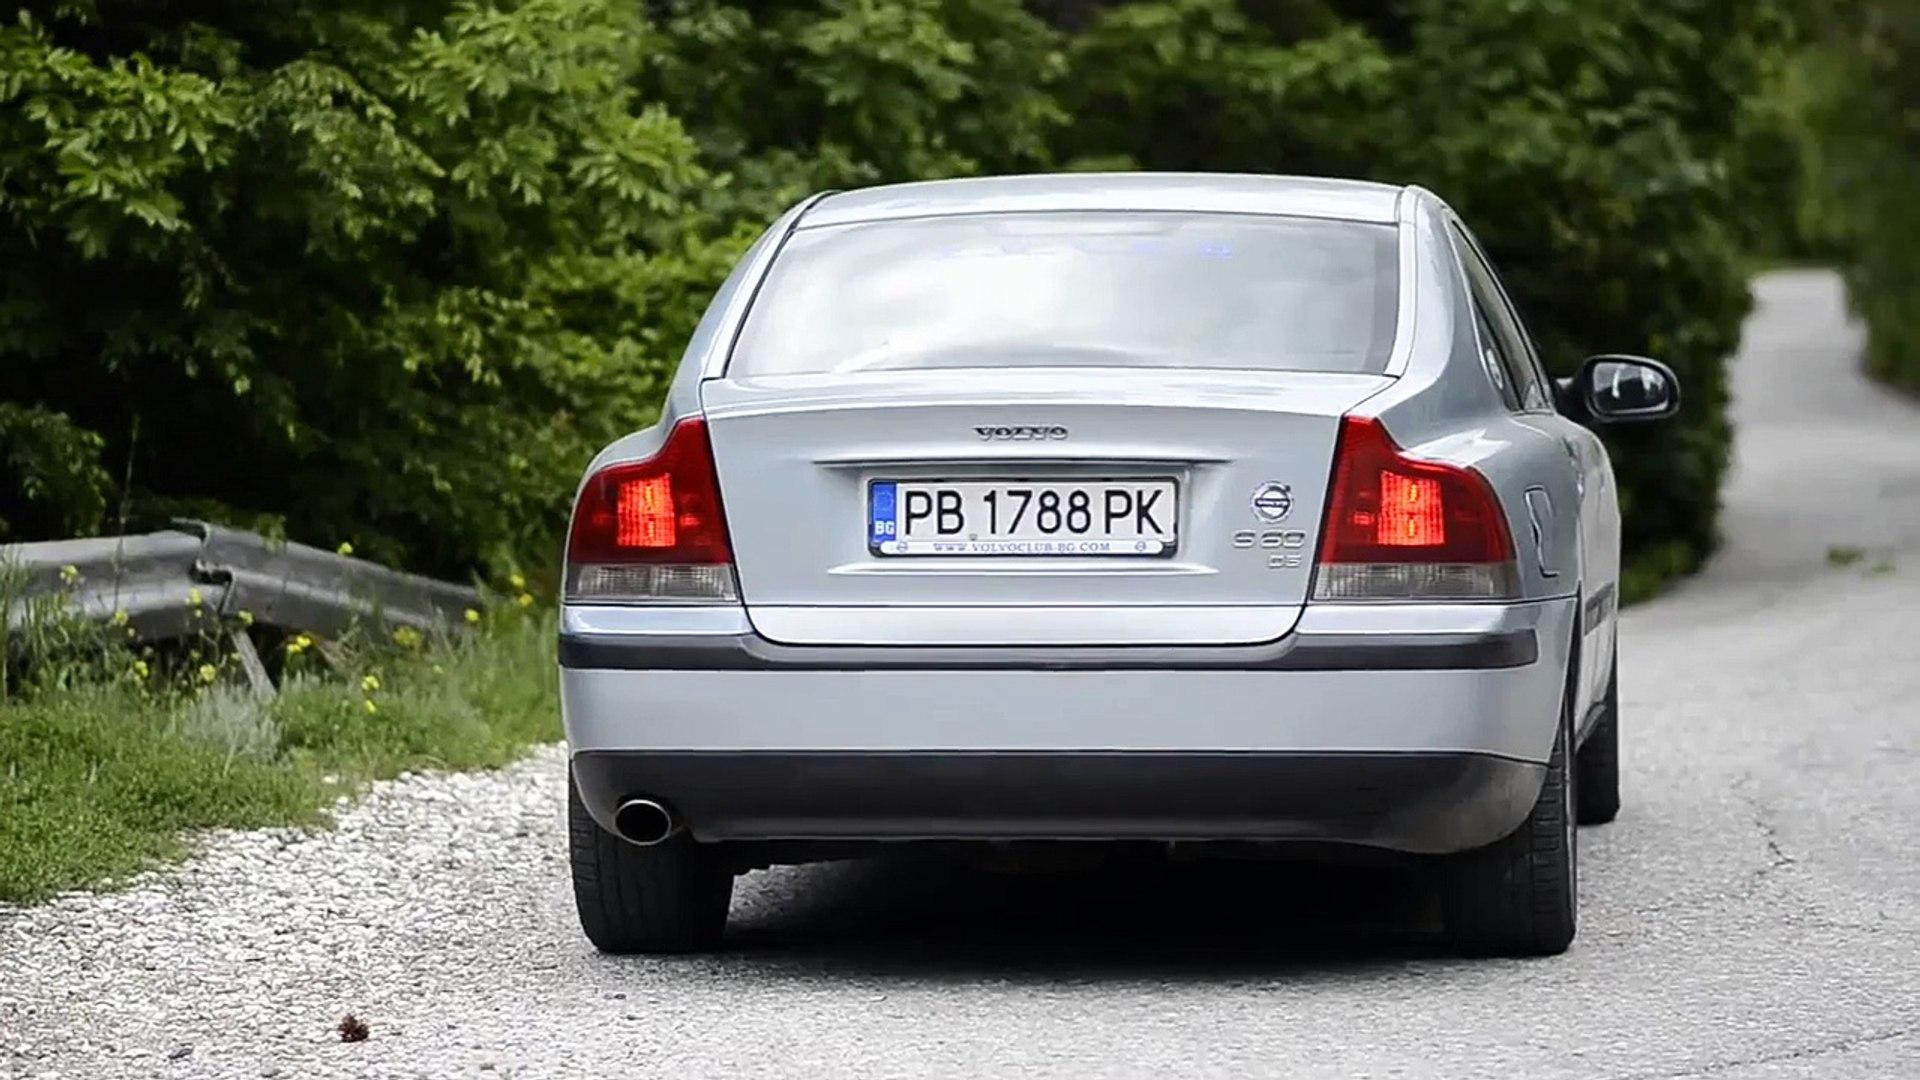 Volvo S60 D5 downpipe brutal sound